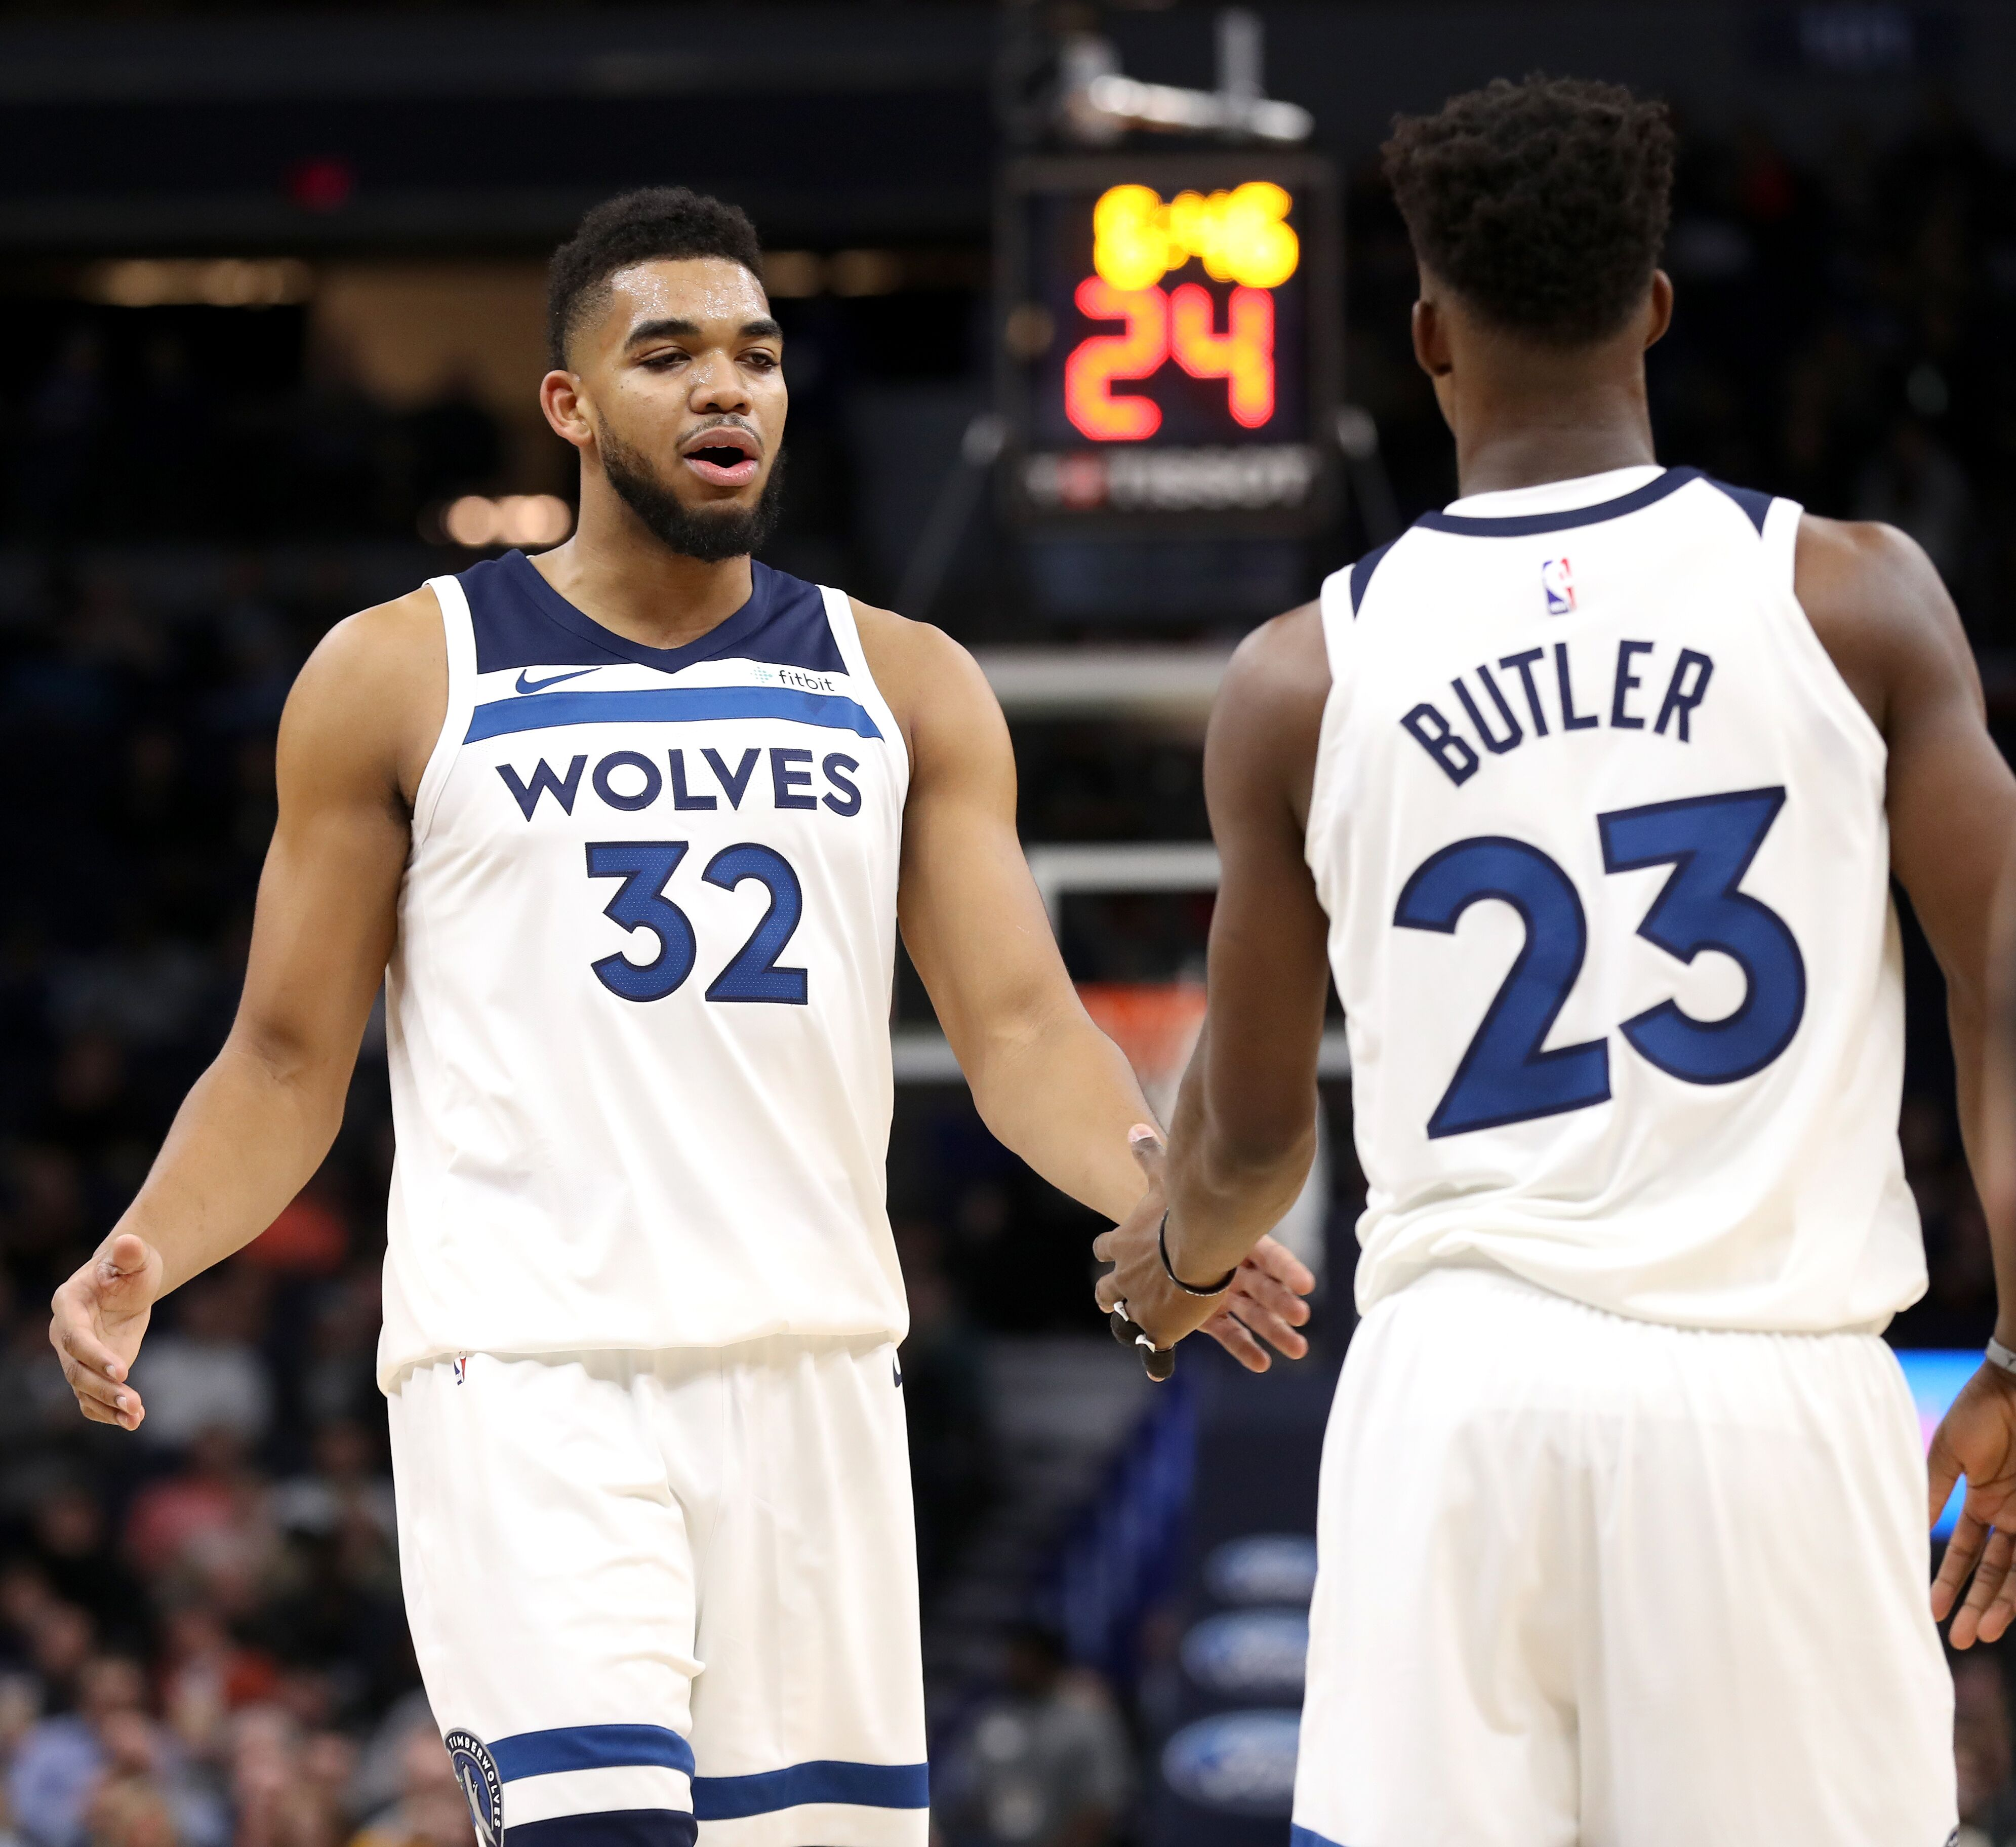 Minnesota Timberwolves: Timberwolves Rumors: Does KAT Have Bad Work Ethic?